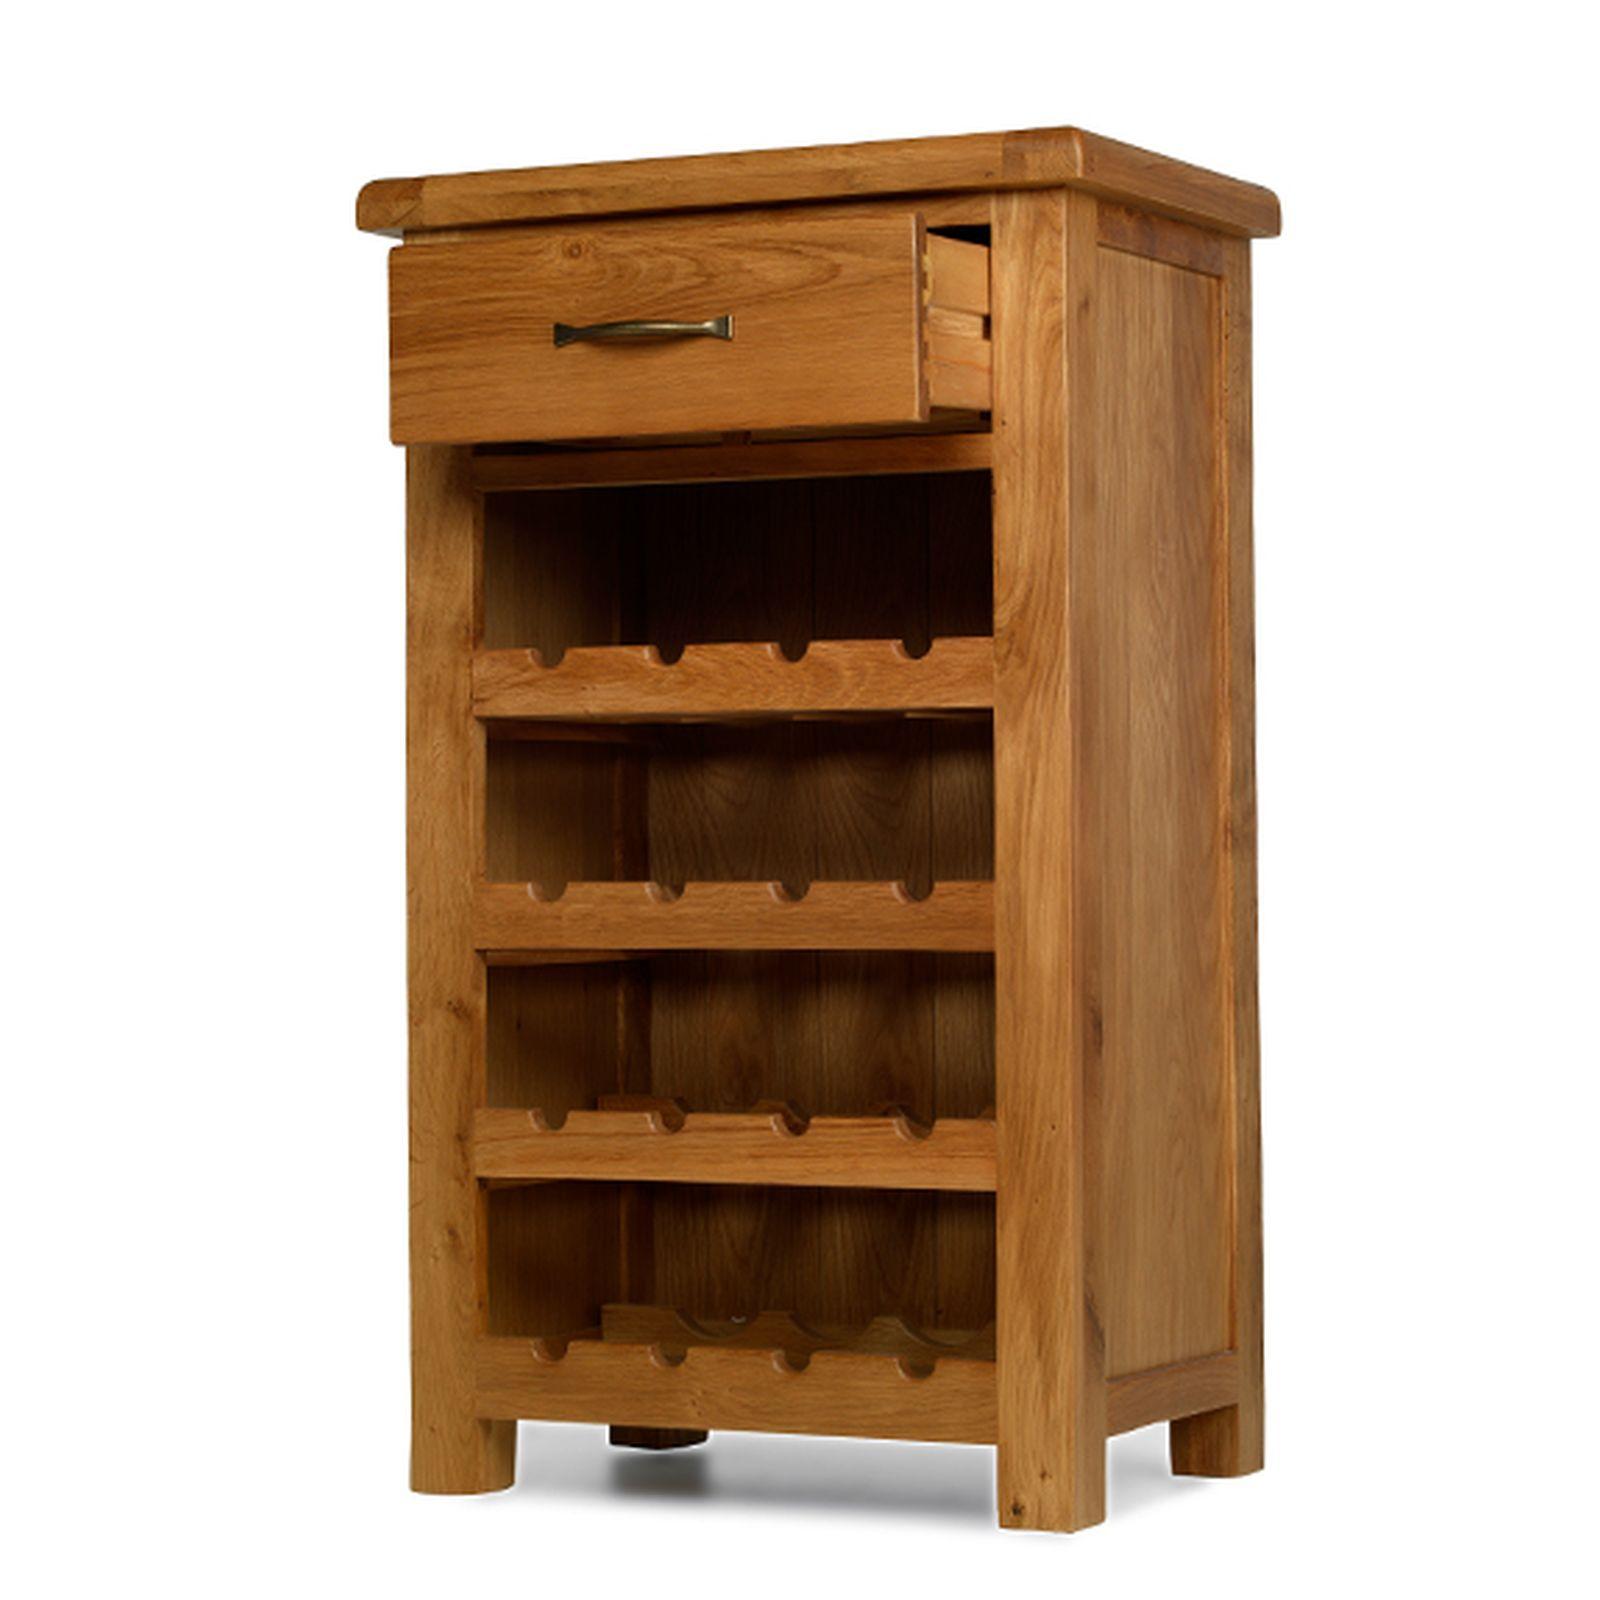 Rushden solid oak furniture small wine bottle cabinet rack